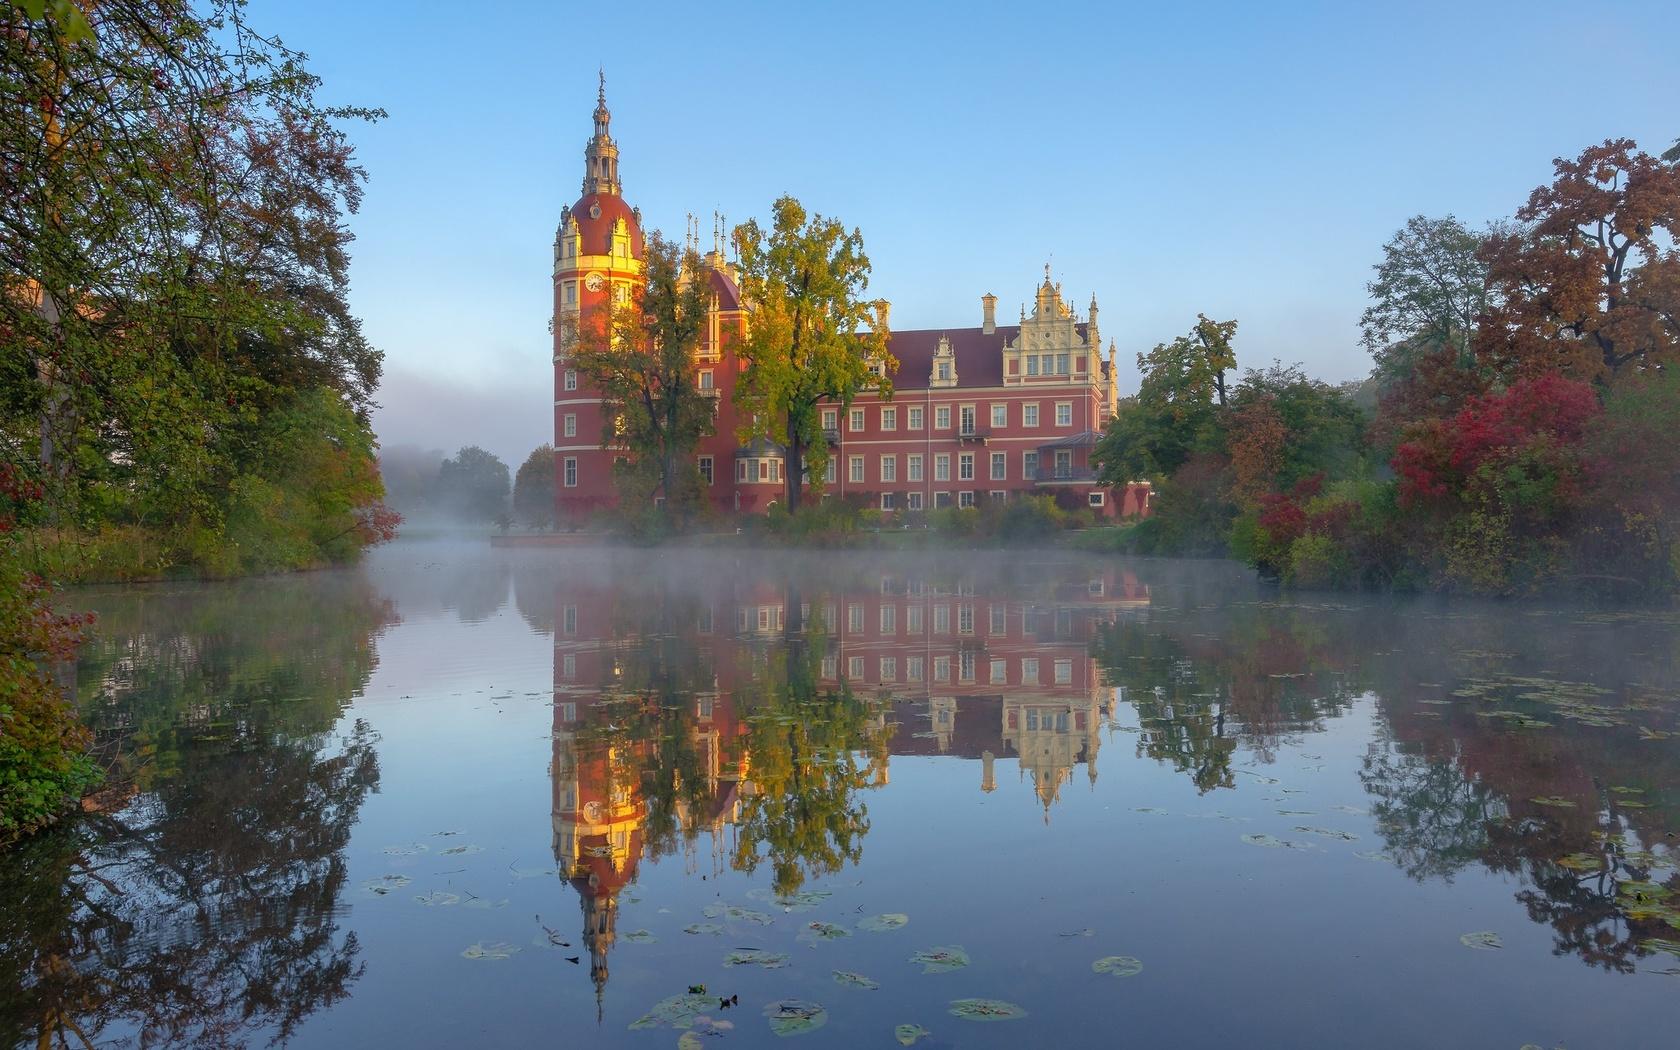 парк, отражение, река, замок, утро, германия, germany, саксония, saxony, muskau park, schloss muskau, lusatian neisse river